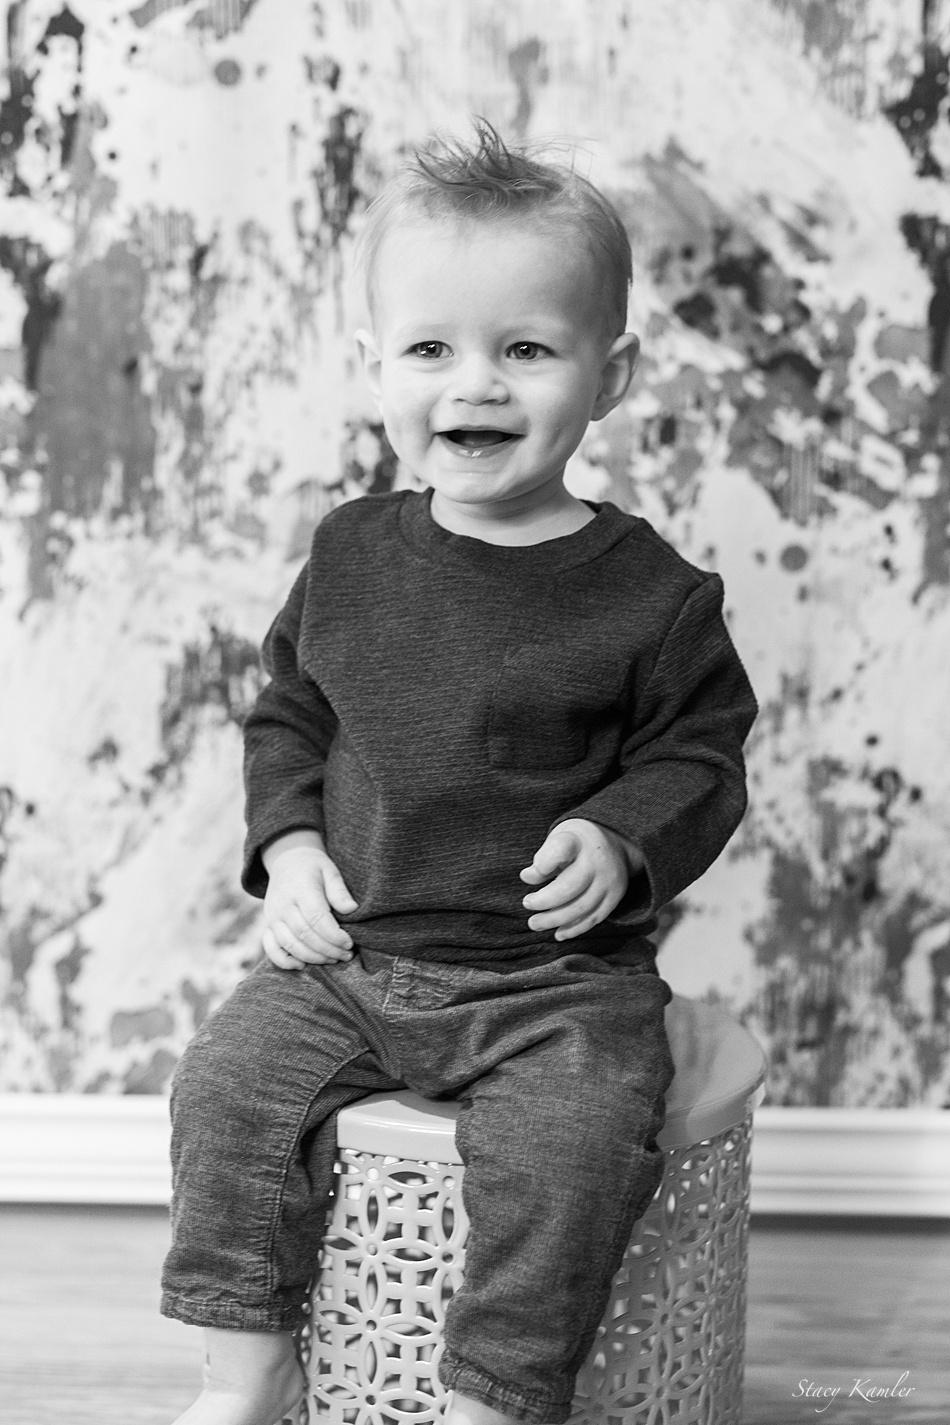 All smiles for little boy